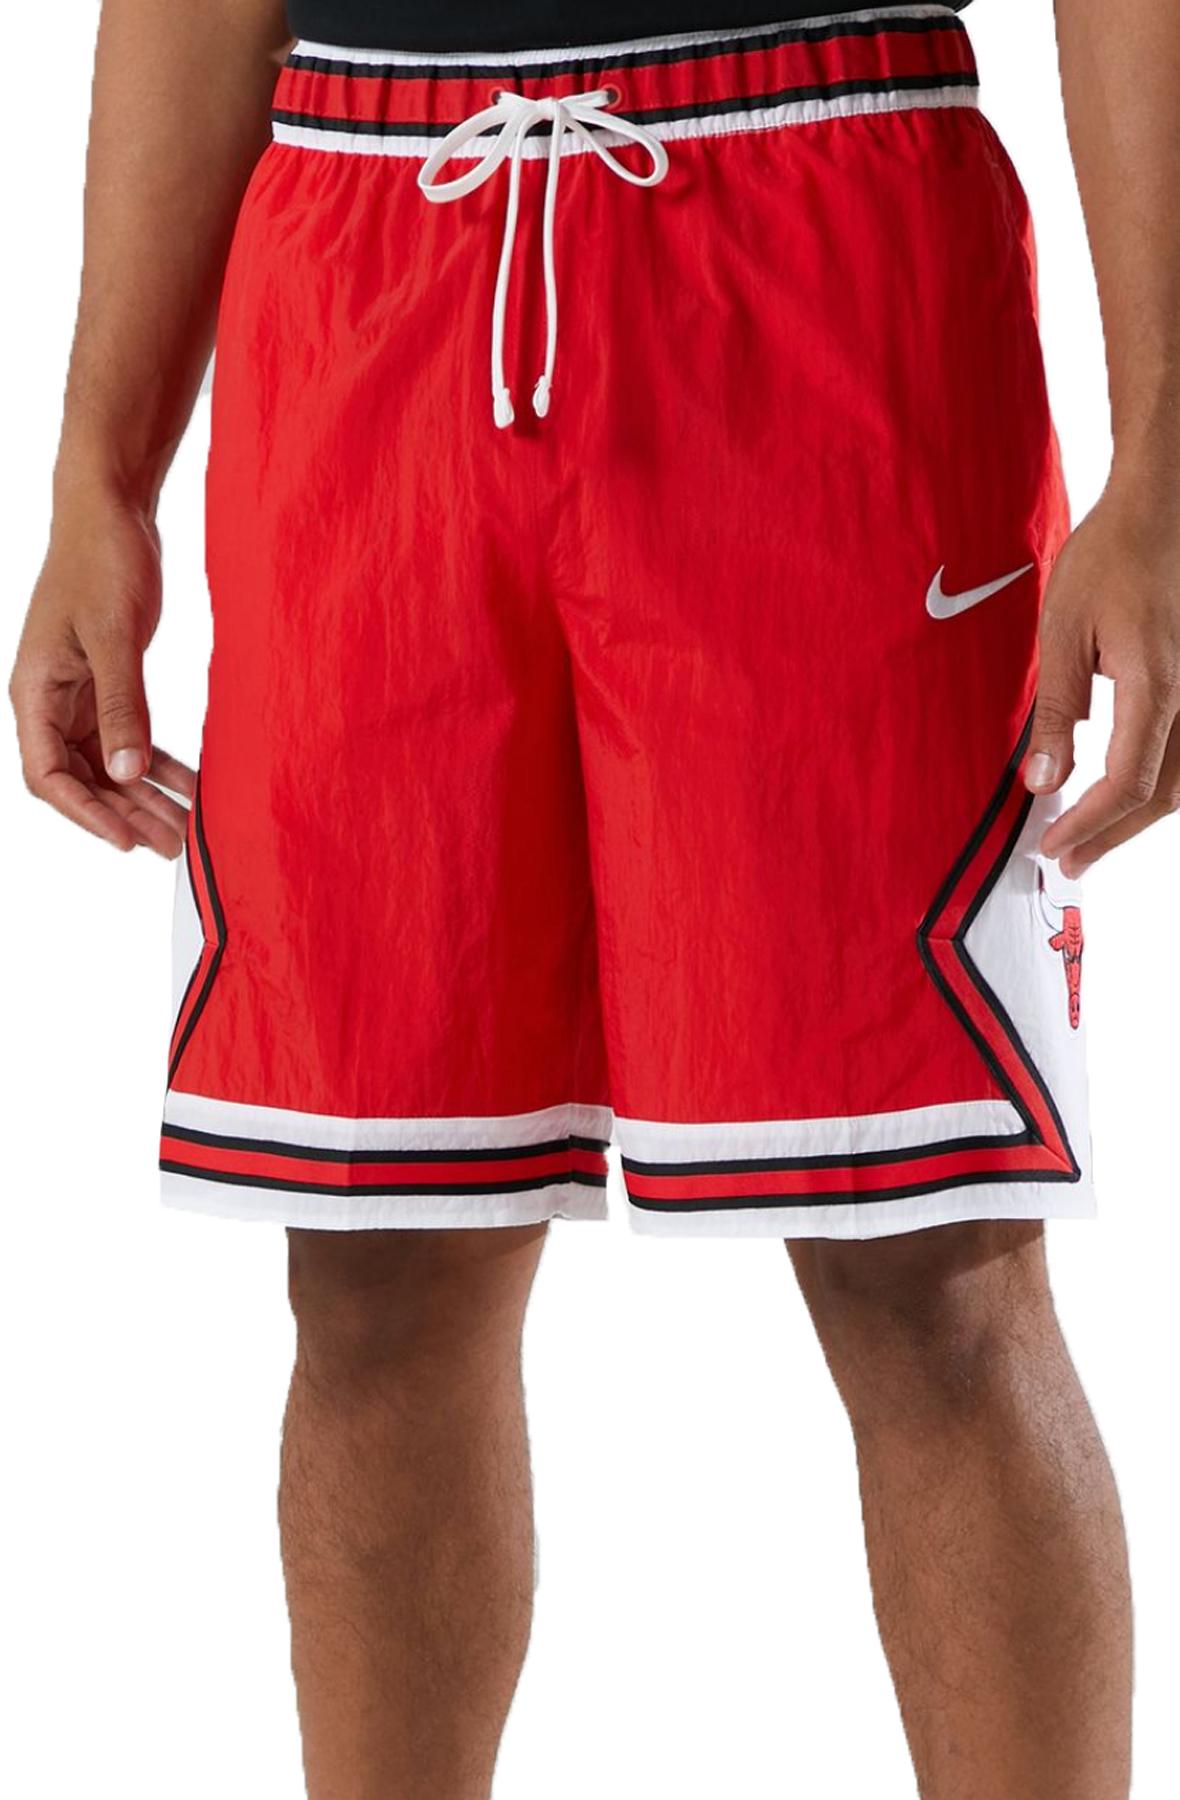 Chicago Bulls Courtside Heritage NBA Shorts University Red/White/Black